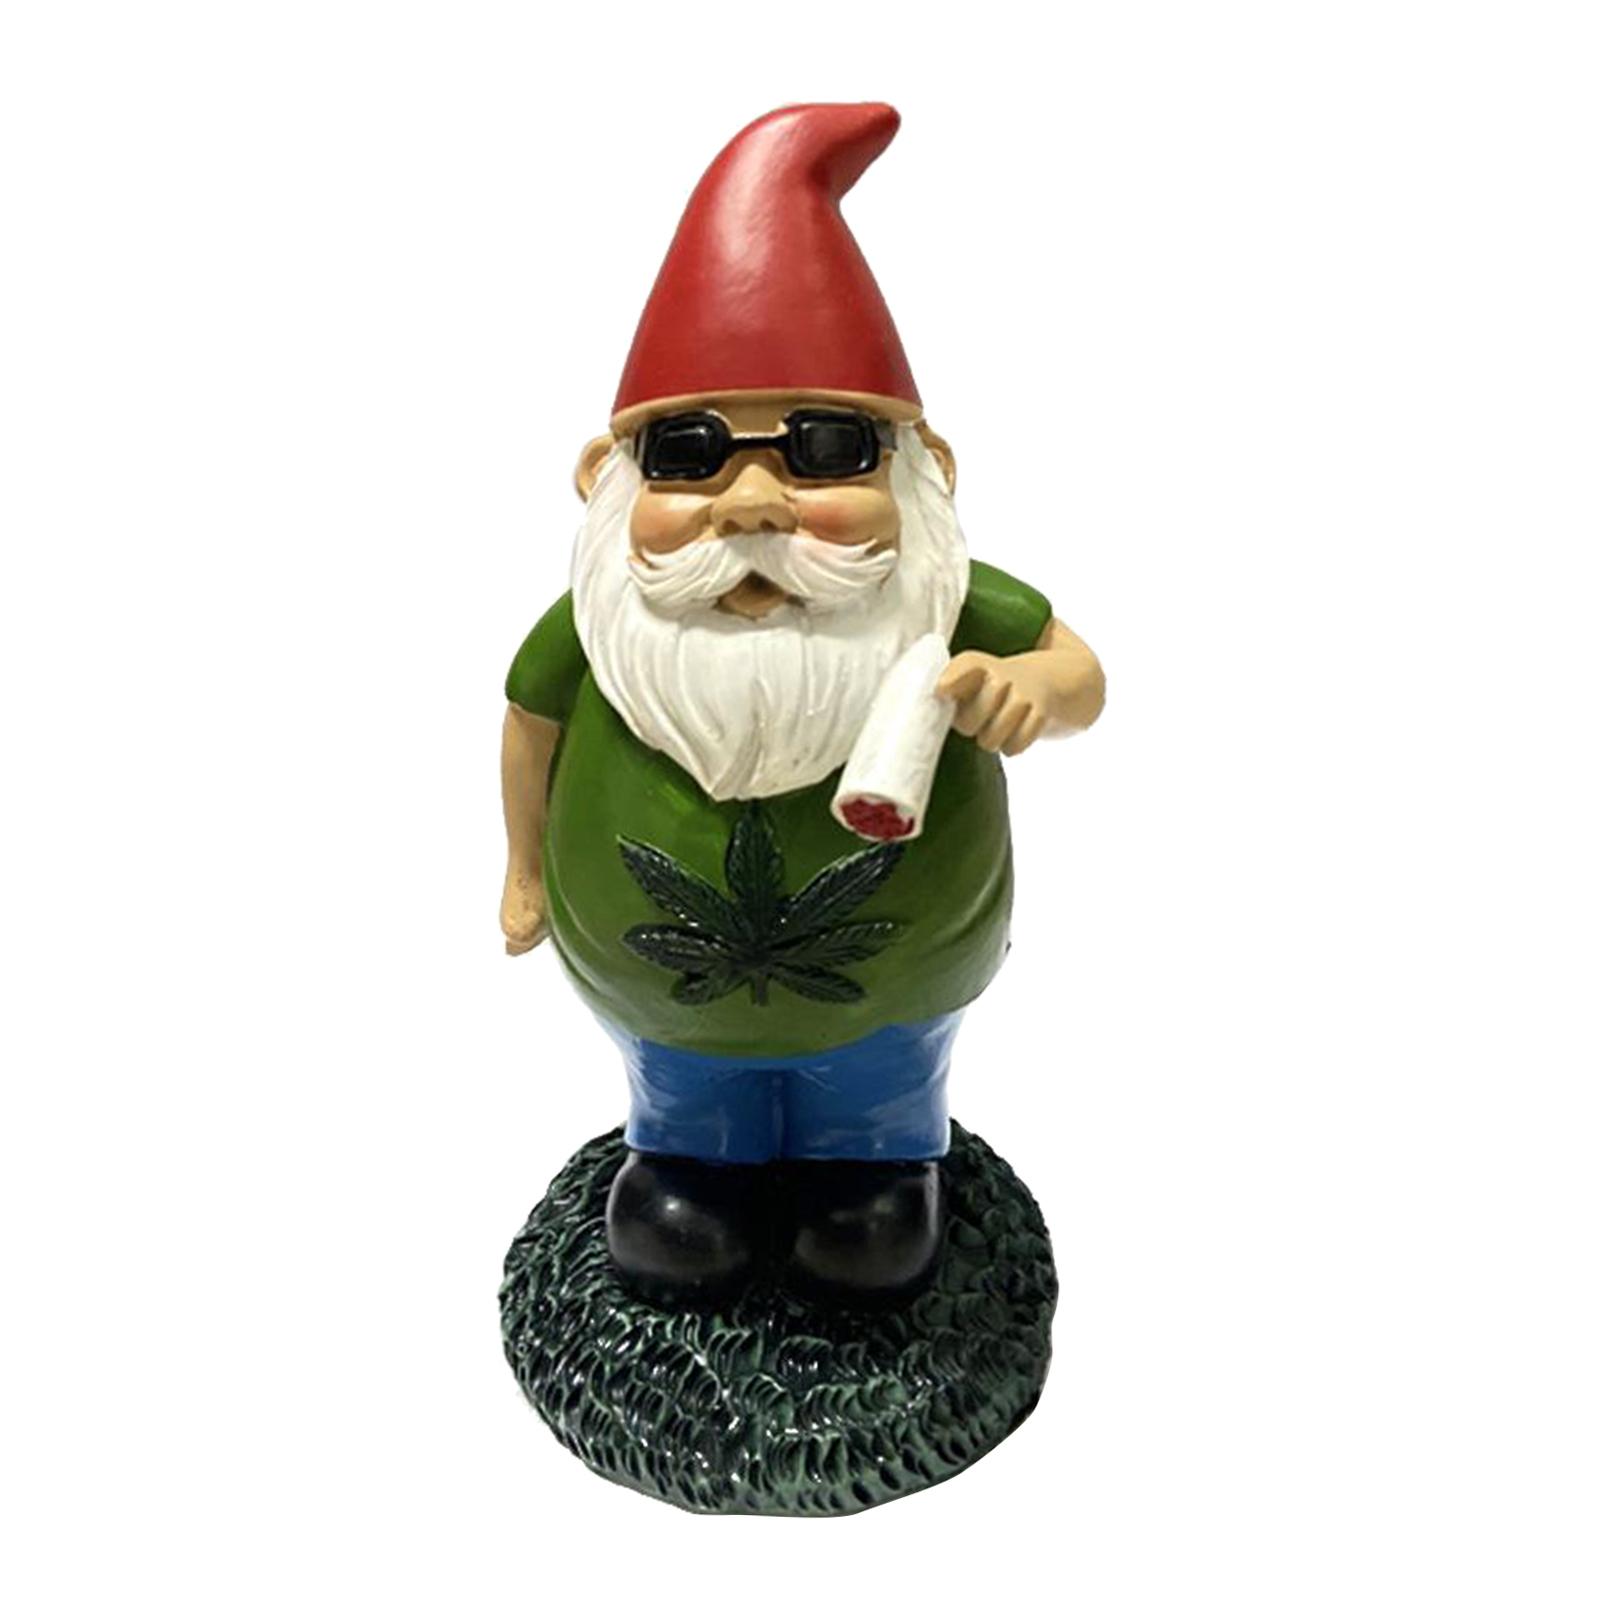 thumbnail 37 - Funny Resin Naughty Garden Gnome Statue Ornaments Outdoor Villa Home Figurines